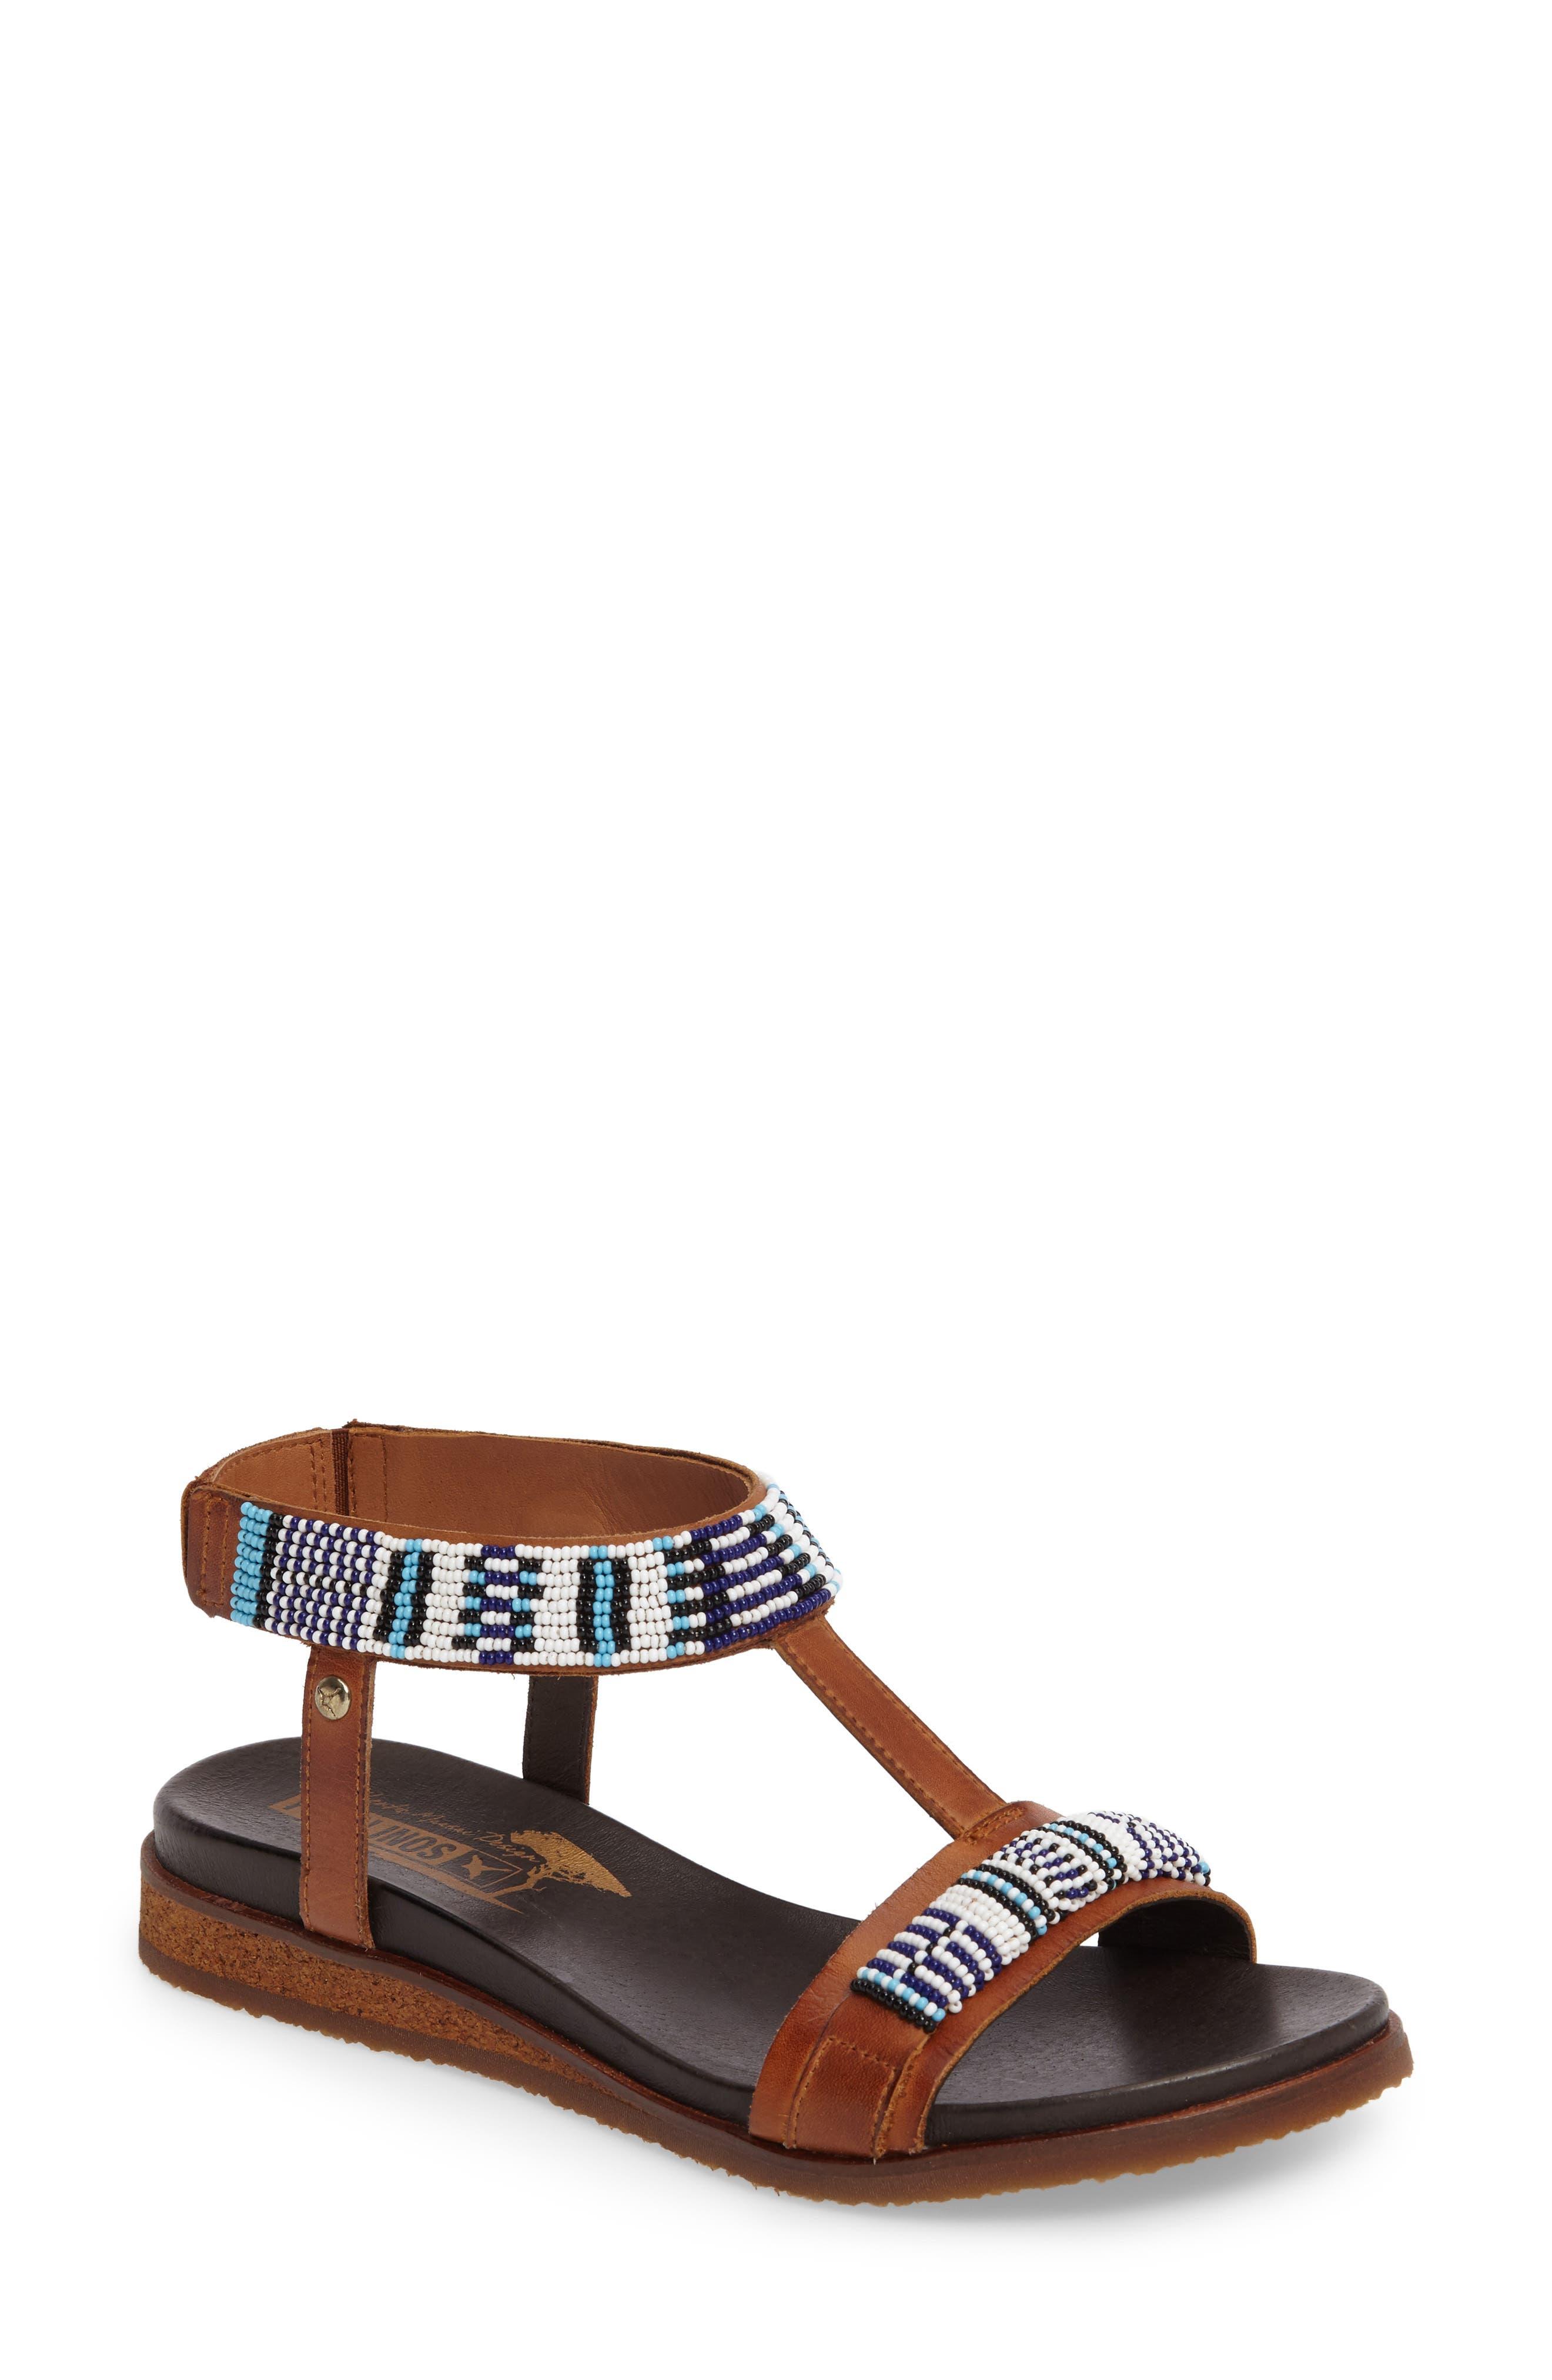 Antillas Beaded Sandal,                         Main,                         color, Brandy Leather